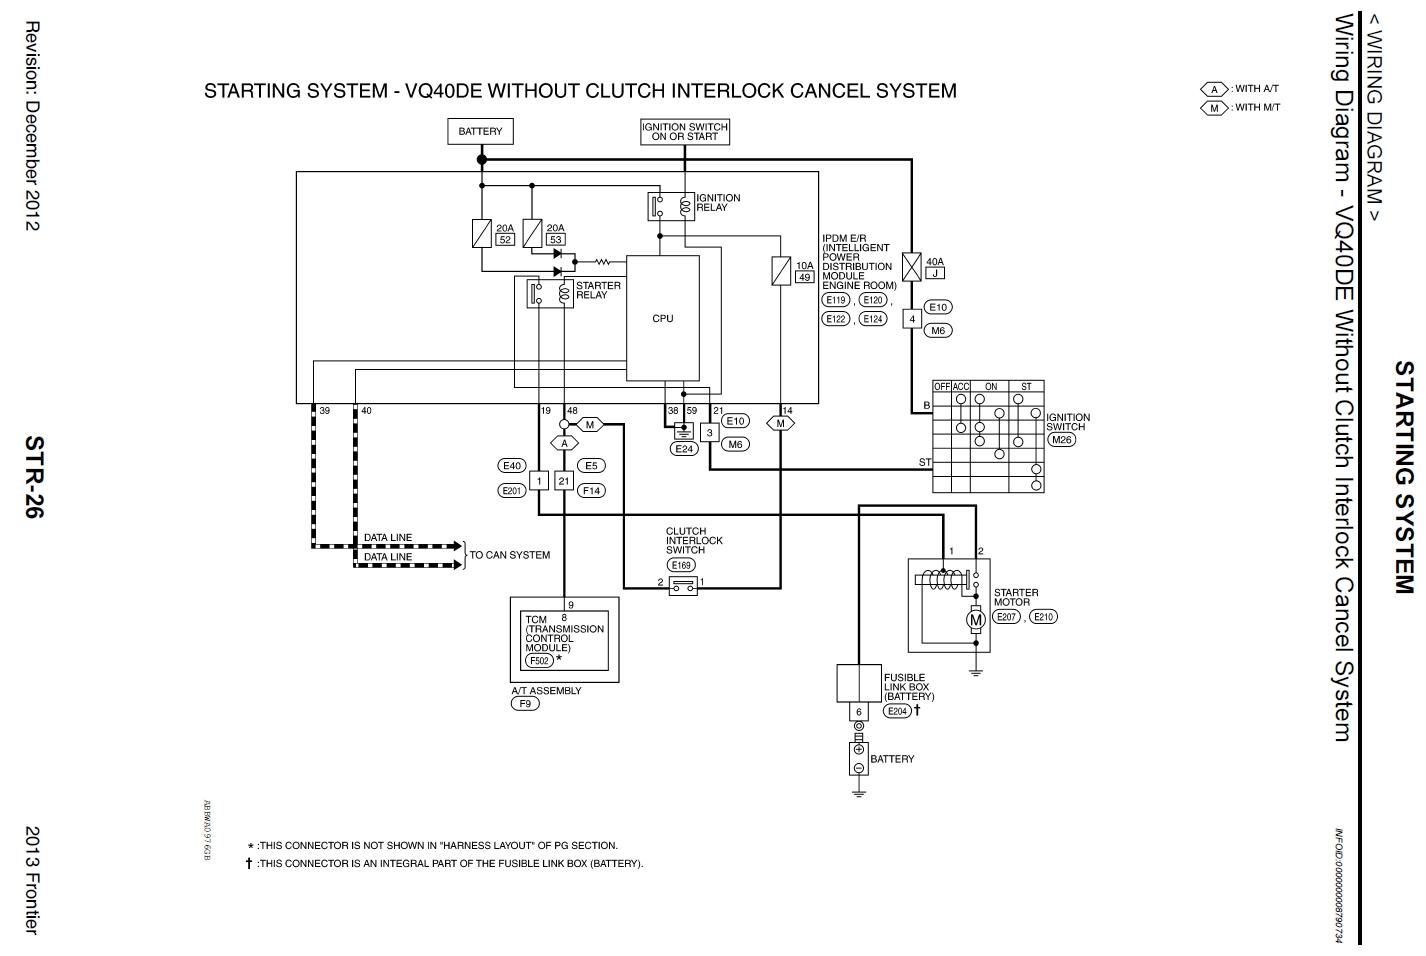 2013 nissan frontier wiring diagram custom wiring diagram u2022 rh littlewaves co 2013 nissan frontier speaker wiring diagram 2013 nissan frontier trailer hitch wiring diagram